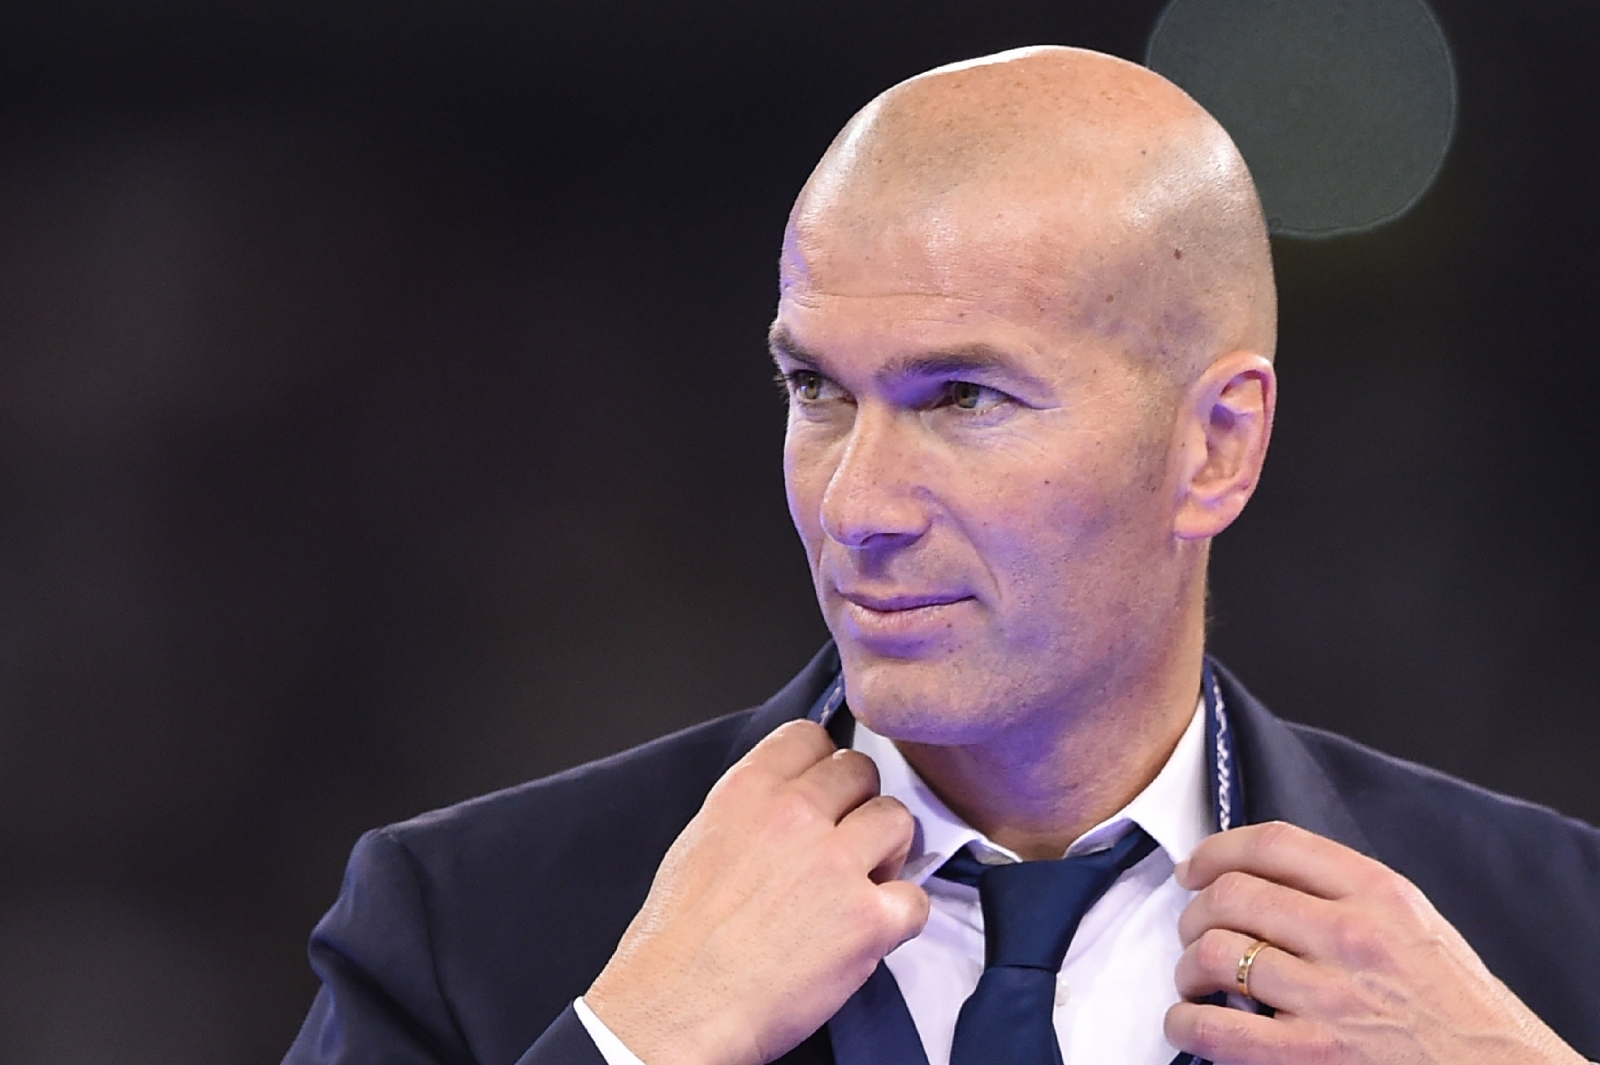 Zinedine Zidane says he has not asked Real Madrid to replace Chelsea striker Alvaro Morata